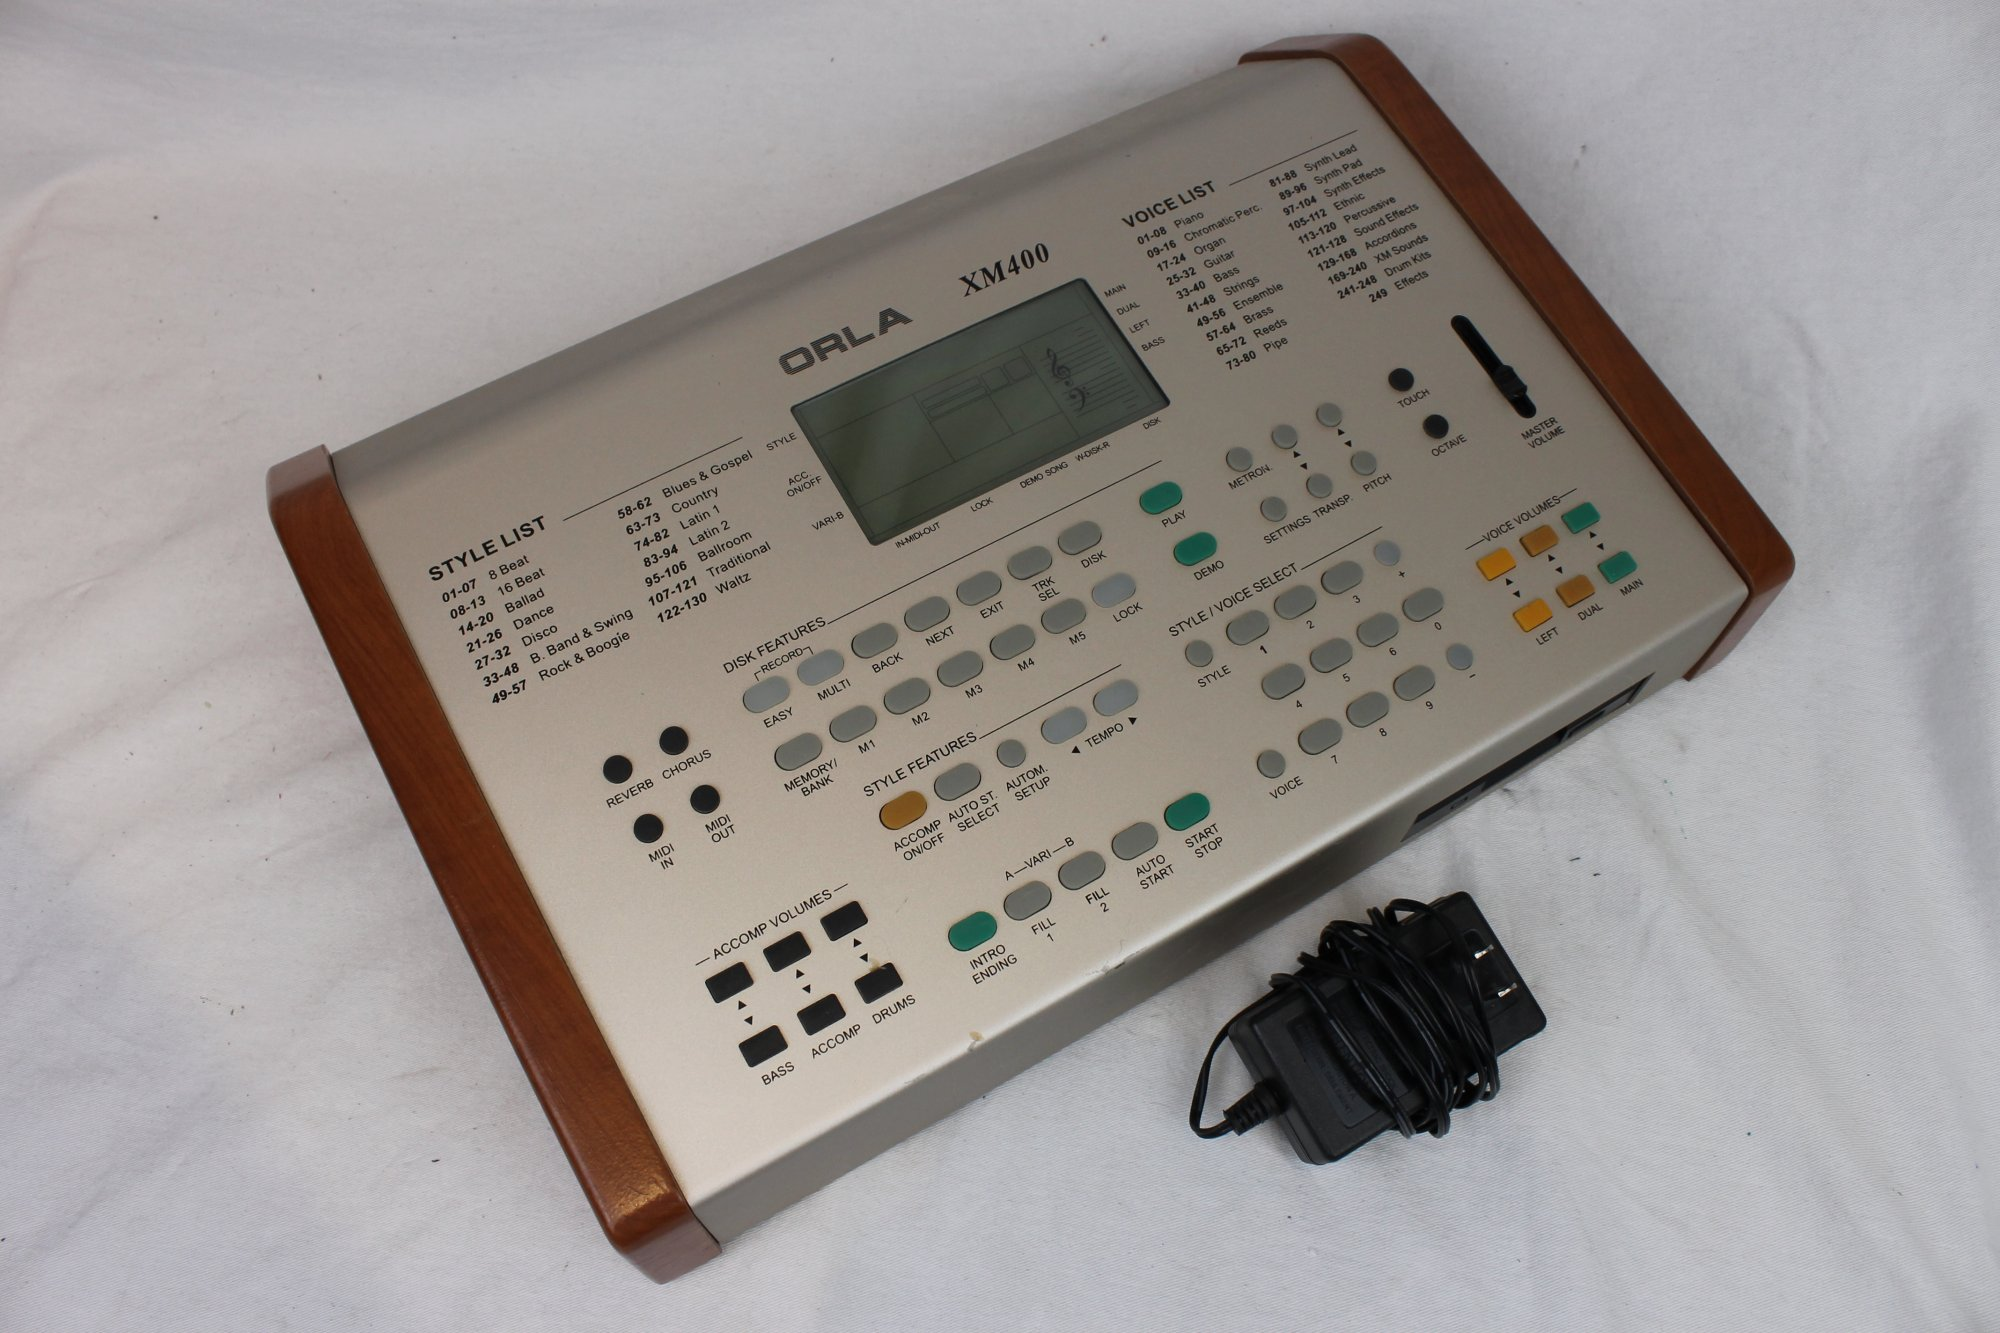 4199 - Orla XM400 Arranger and Midi Sound Module